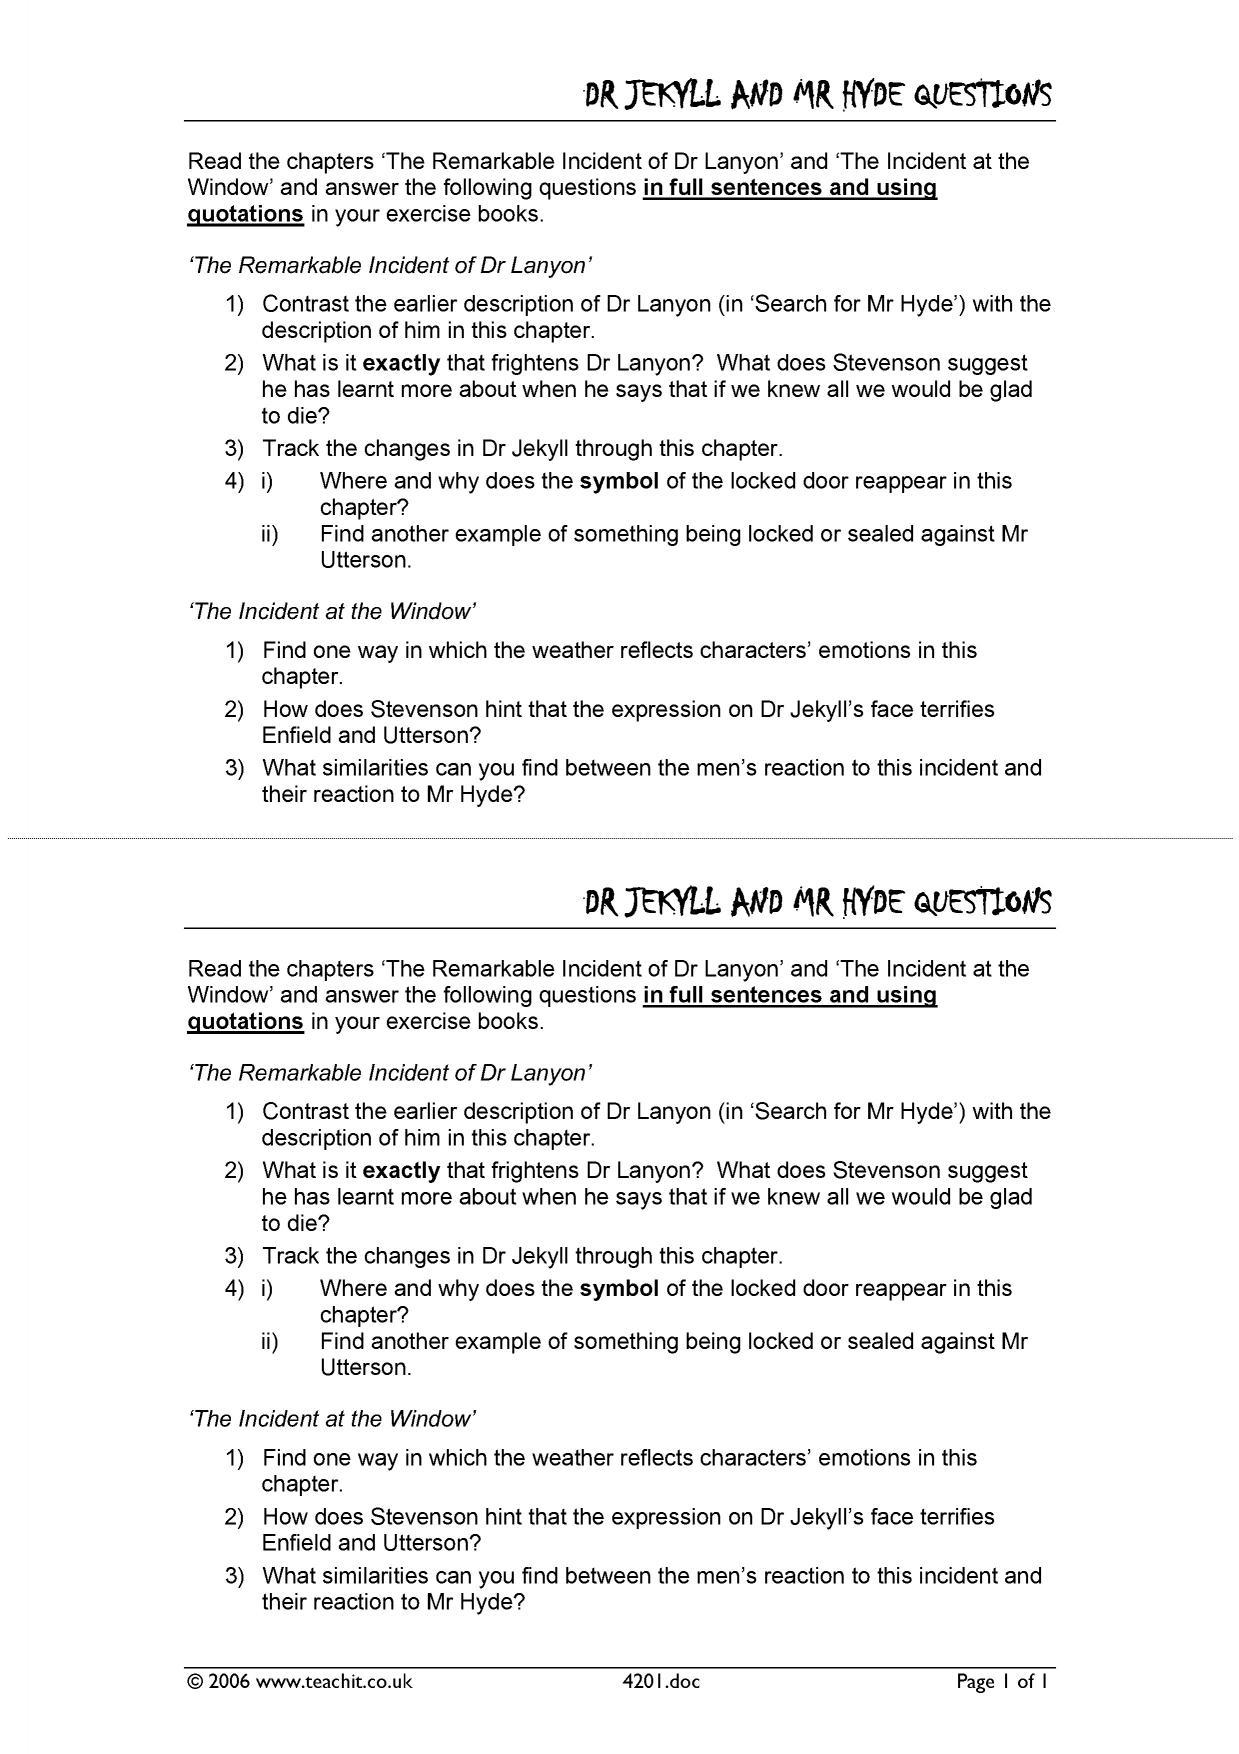 an analysis of the novel the strange case of drjekyll and mr hyde by robert louis stevenson Dr jekyll and mr hyde robert louis stevenson plot overview summary & analysis order the strange case of dr jekyll and mr hyde and other stories at bncom.